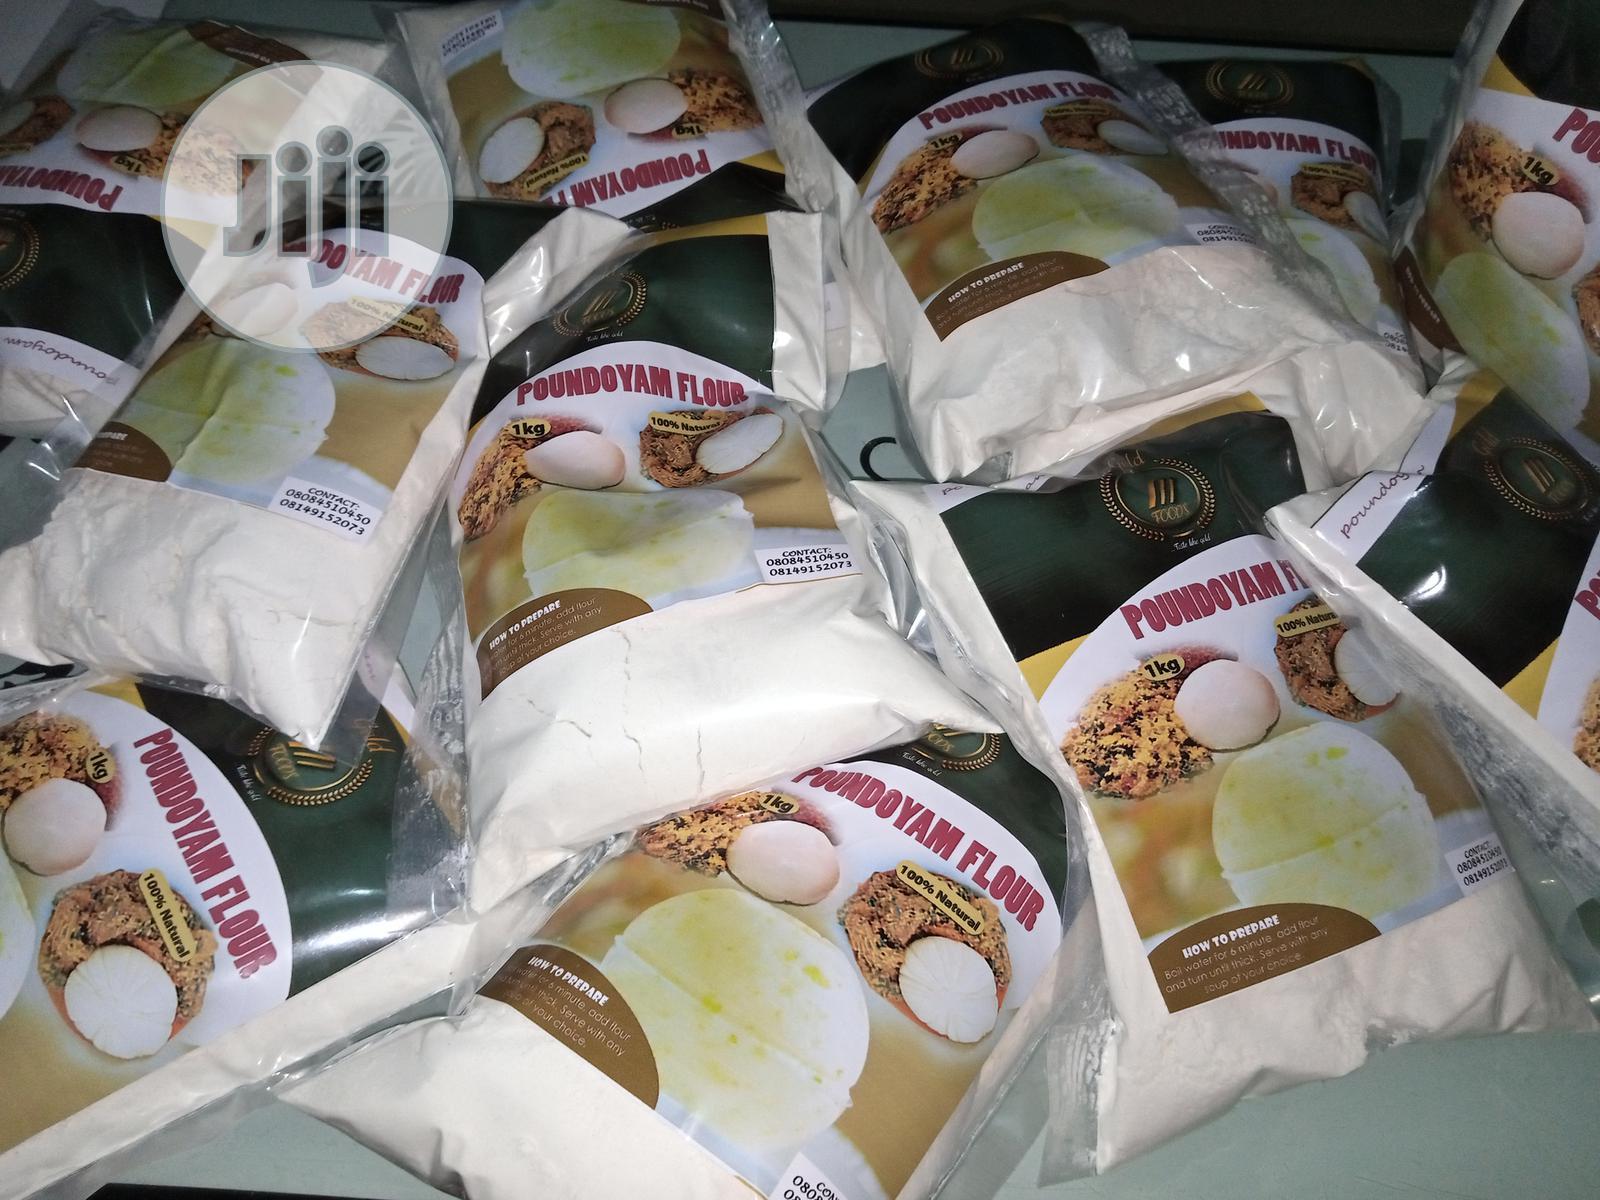 Archive: Poundo Yam Flour (Iregold) Per 1